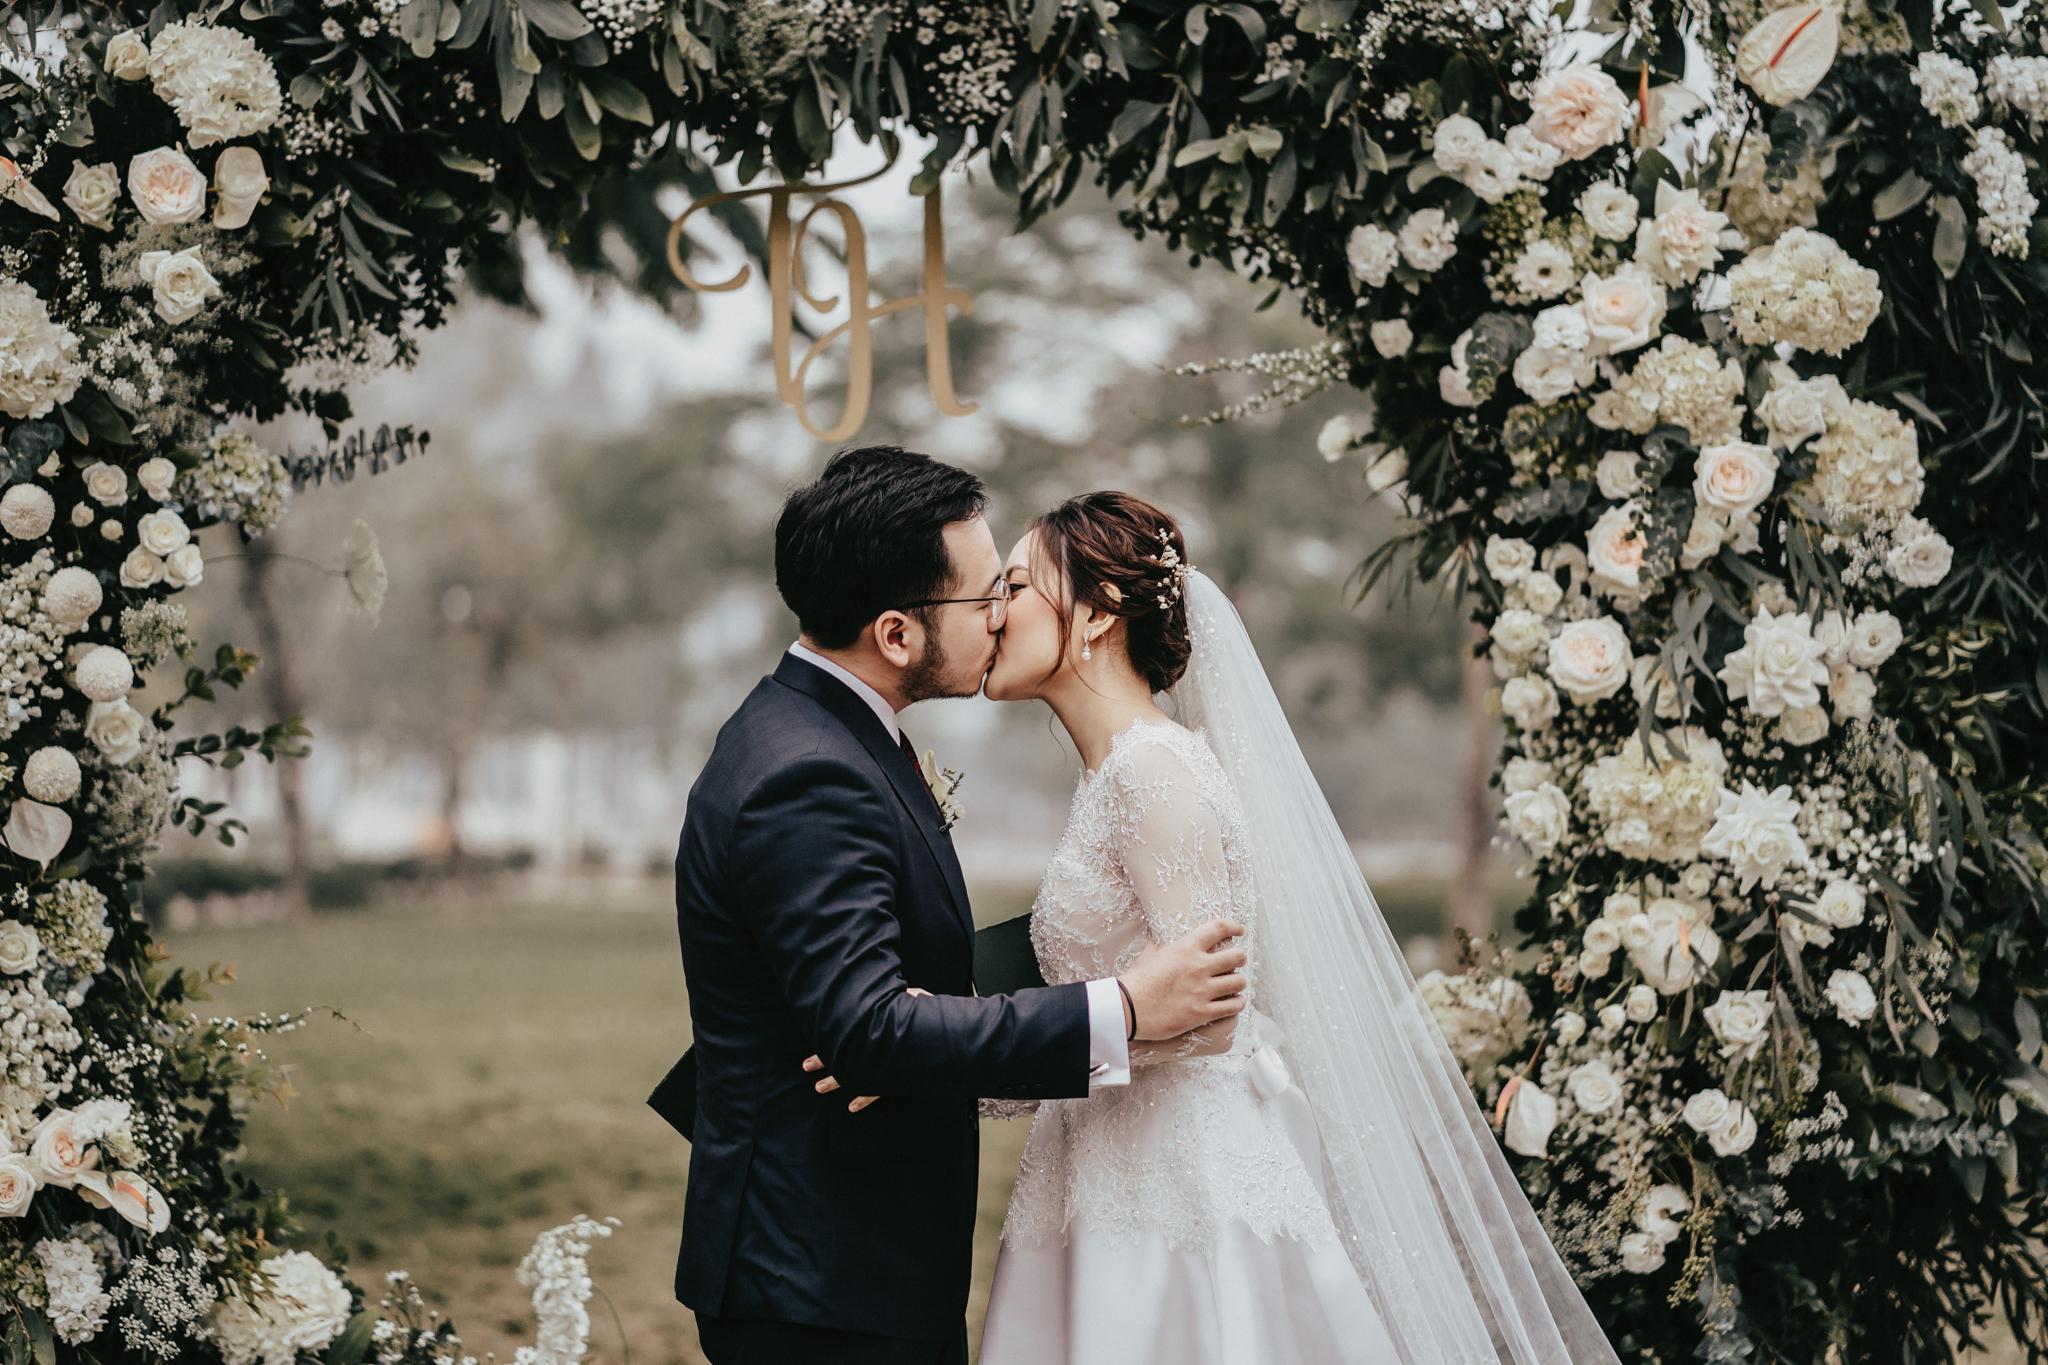 JWMarriott Ha Noi Intimate Wedding of Trang Hi well captured by Hipster Wedding Vietnam Wedding Photographer-97356.jpg